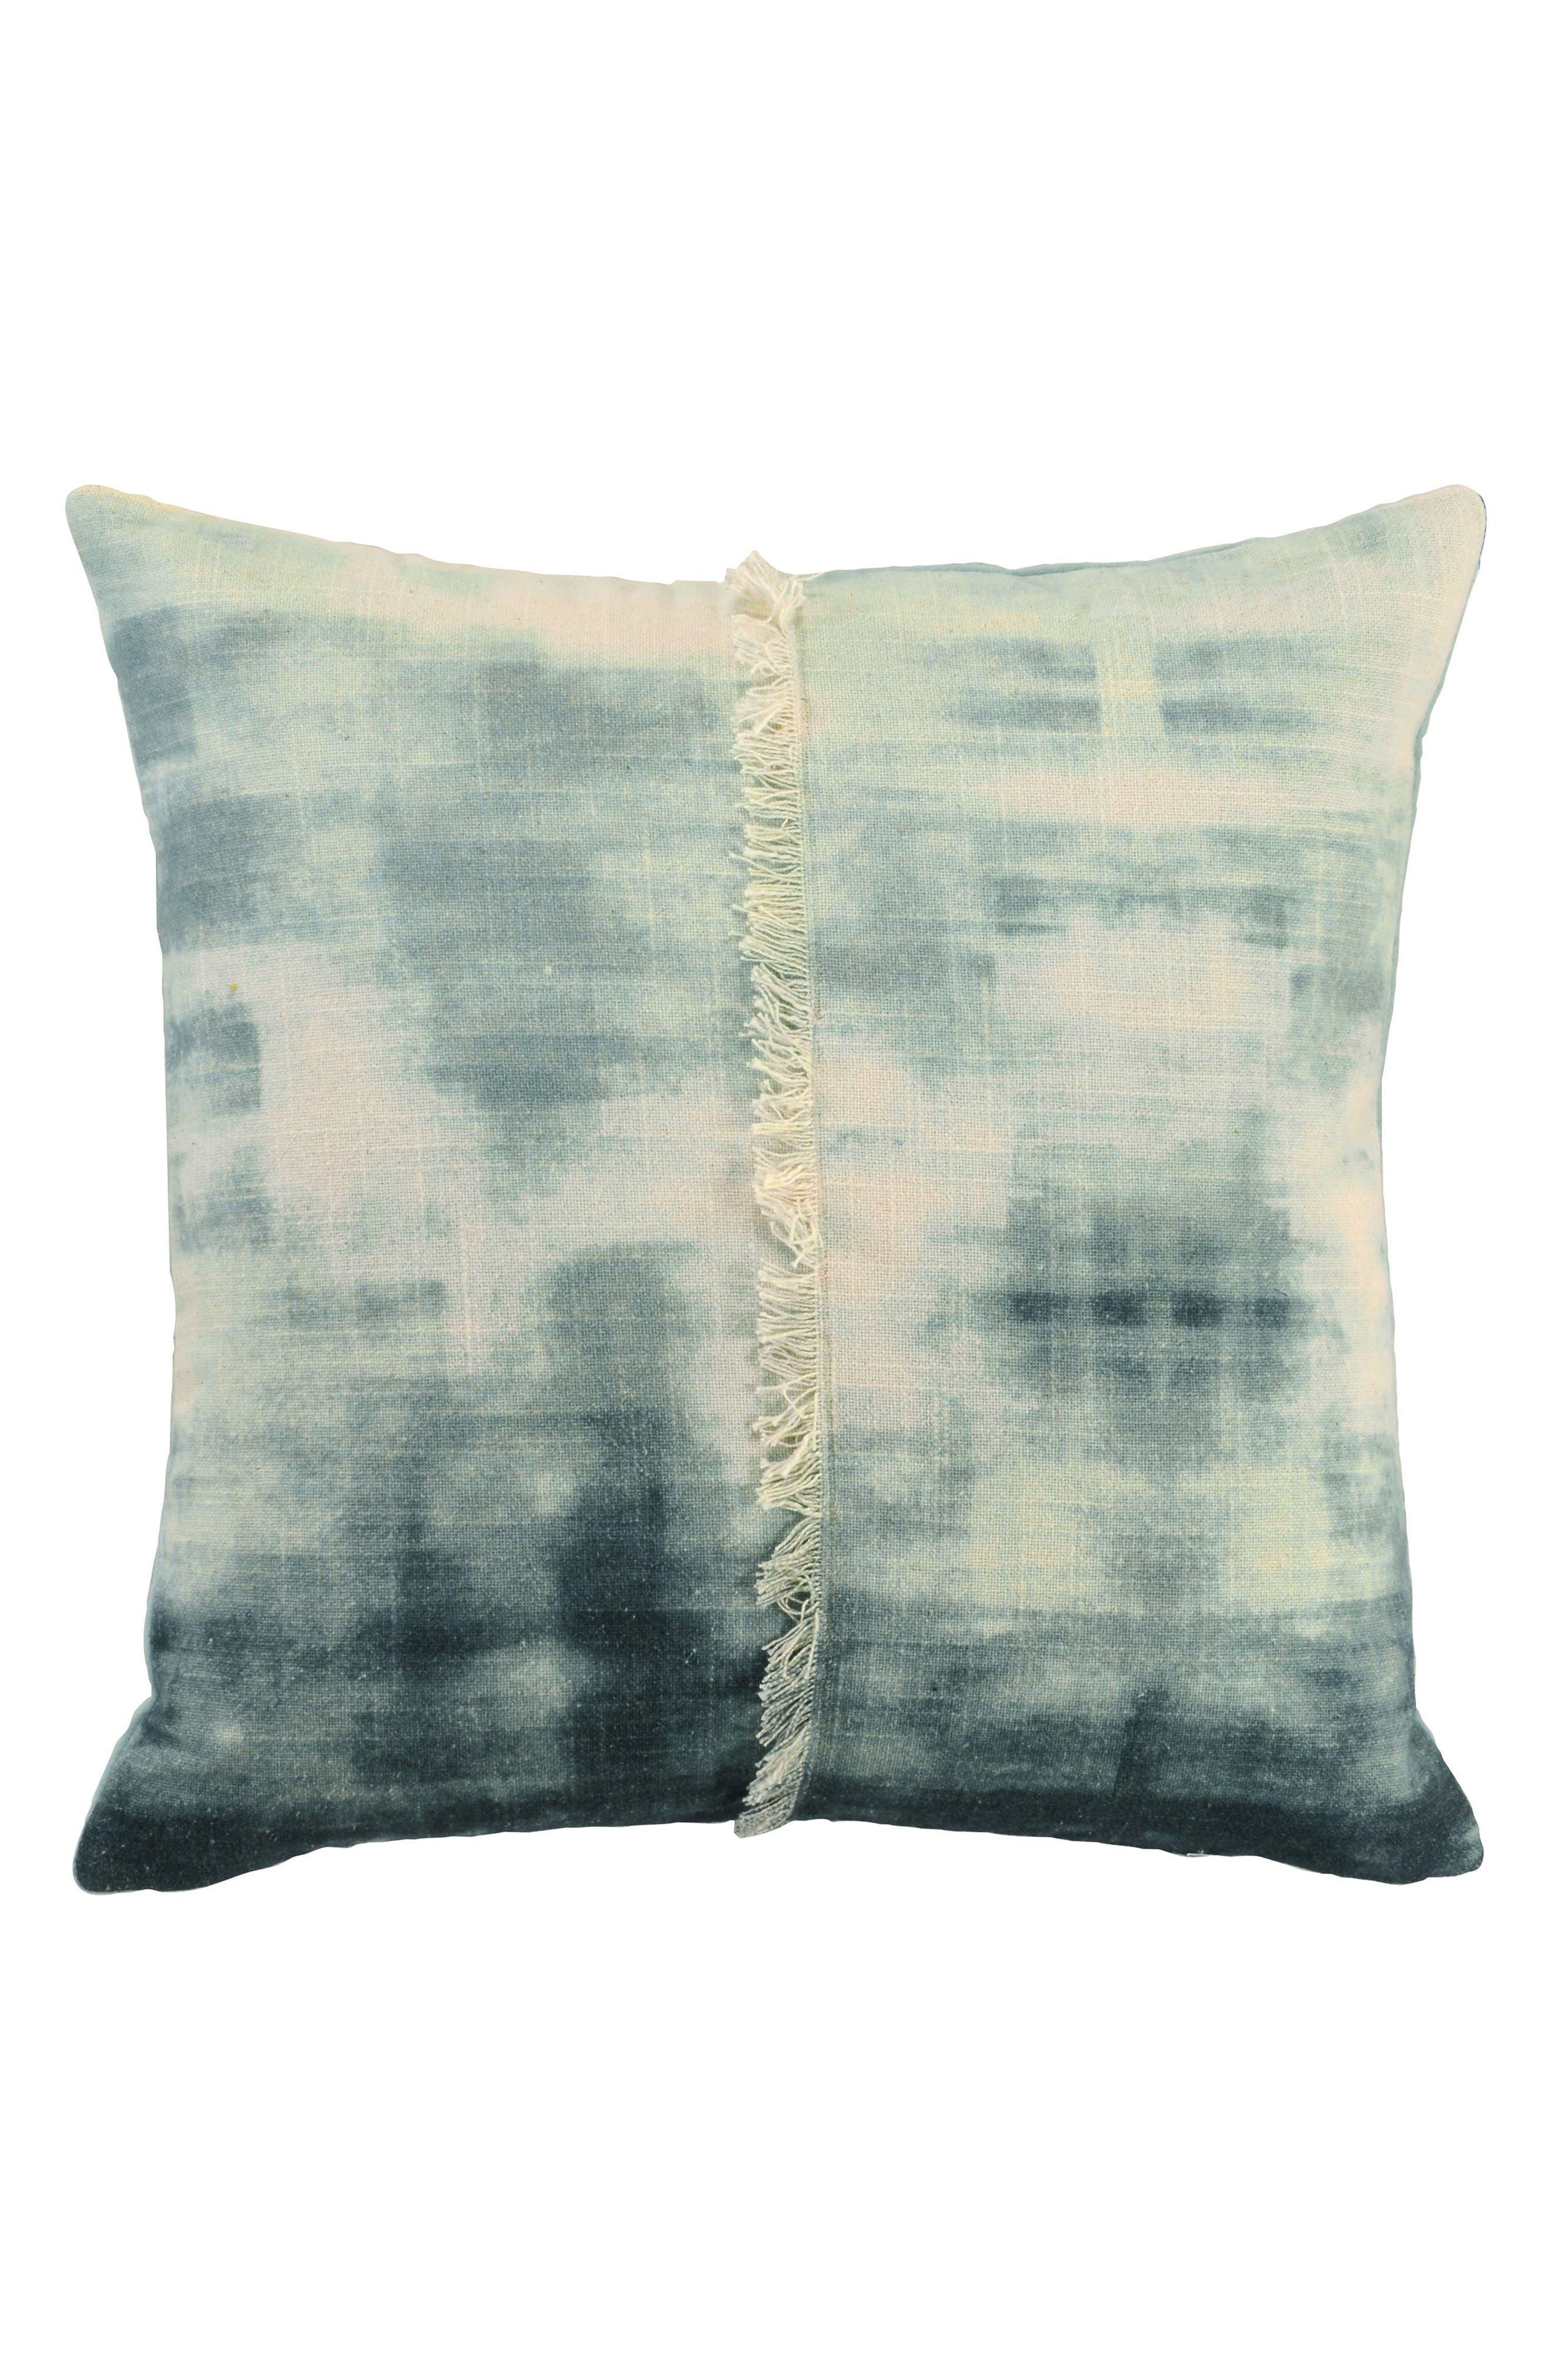 Kino Tidal Accent Pillow,                         Main,                         color, Seaglass Blue